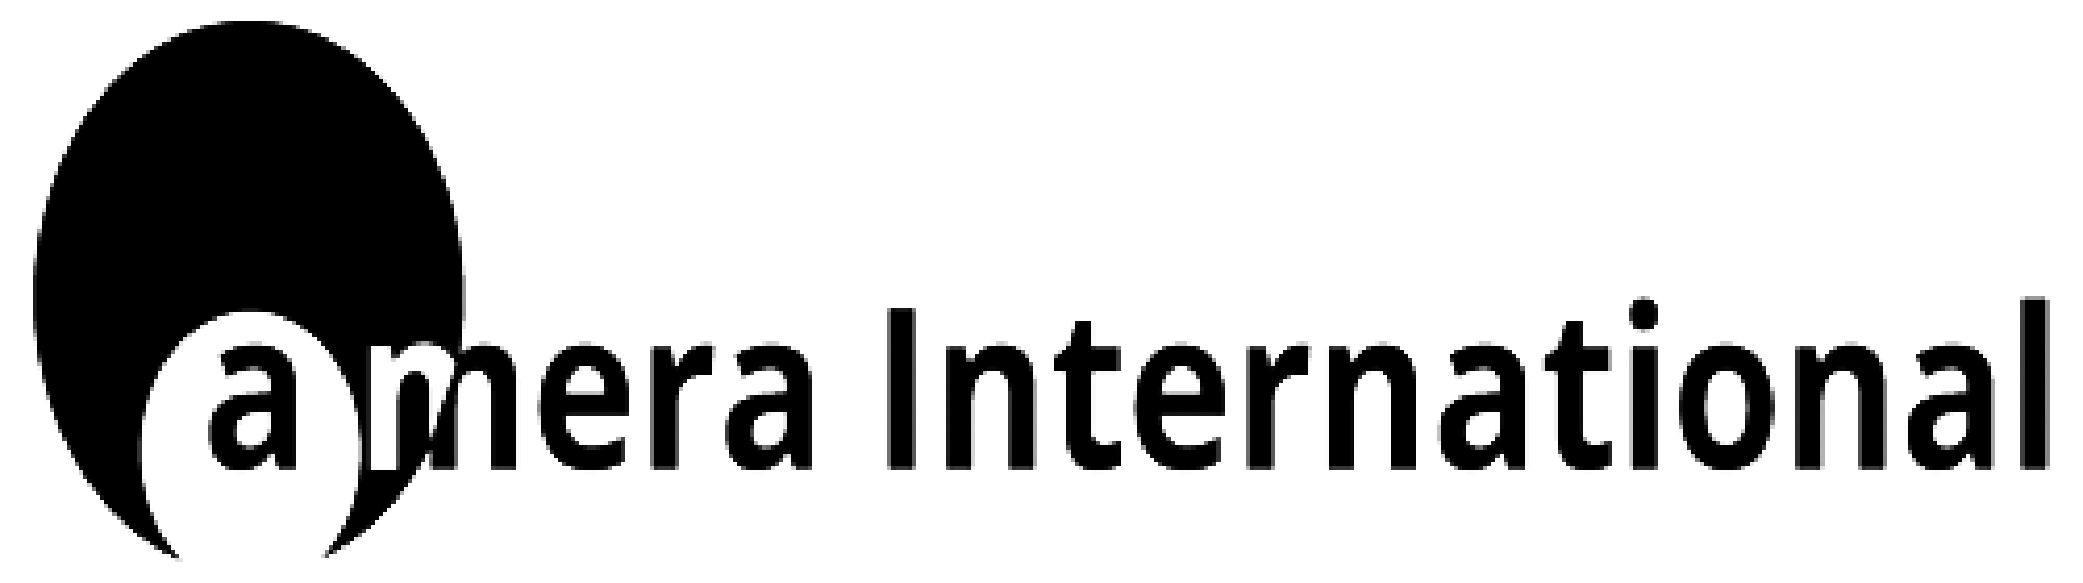 Amera International Logo Larger